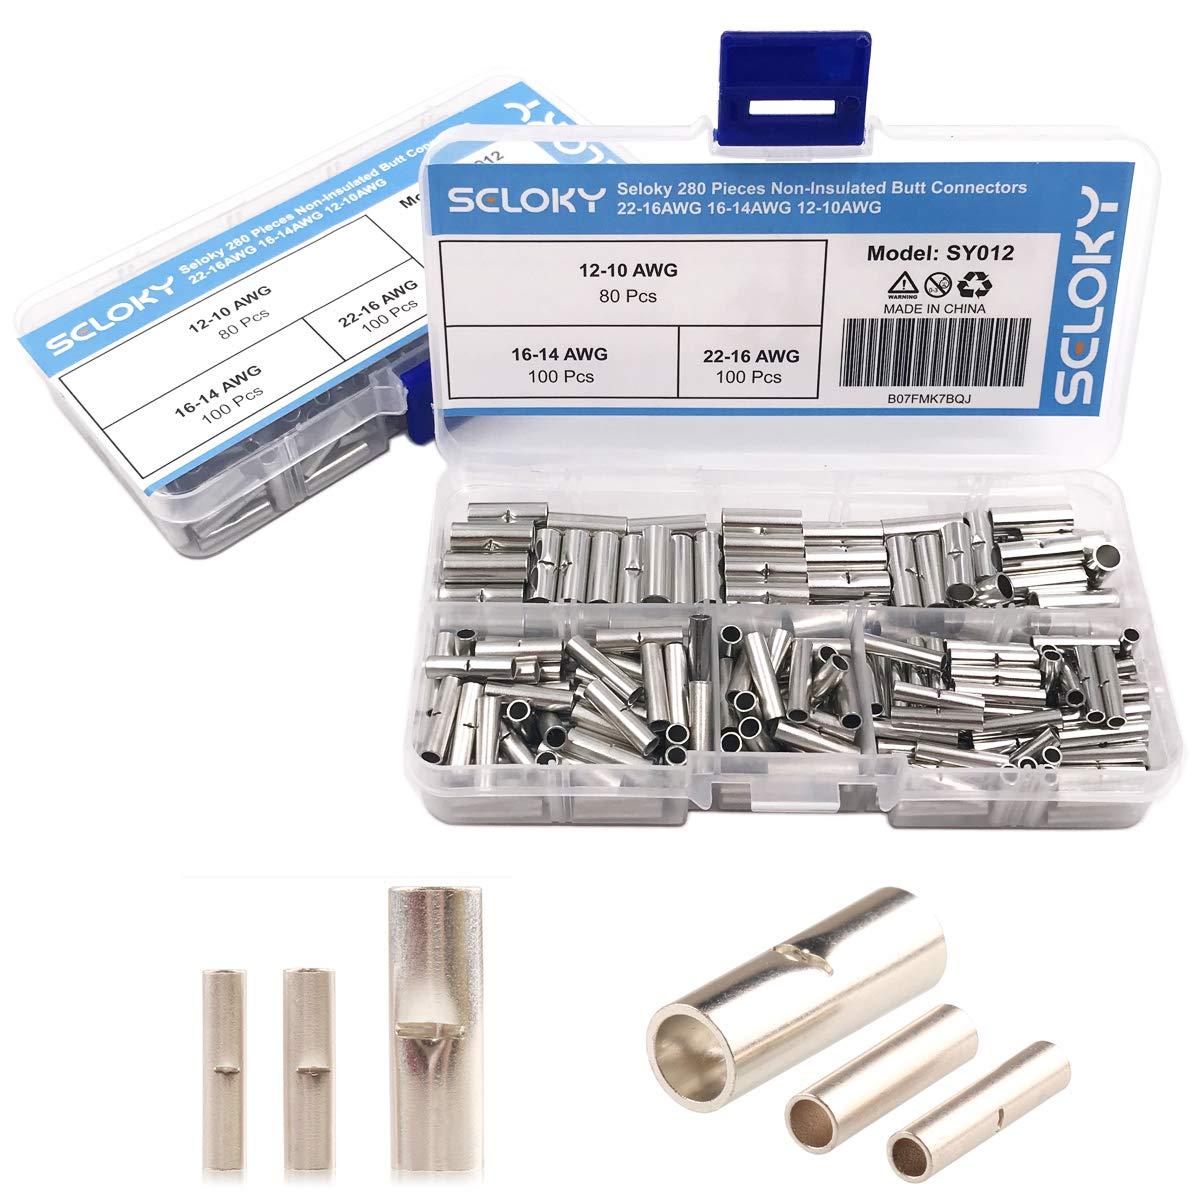 seloky 280 Teile nicht isolierend Stoß verbinder unisolierter Draht Hü lse Kabel Crimp Terminal Kit fü r elektrische Splice DIY (22– 16 AWG 16– 14 AWG 12– 10 AWG)